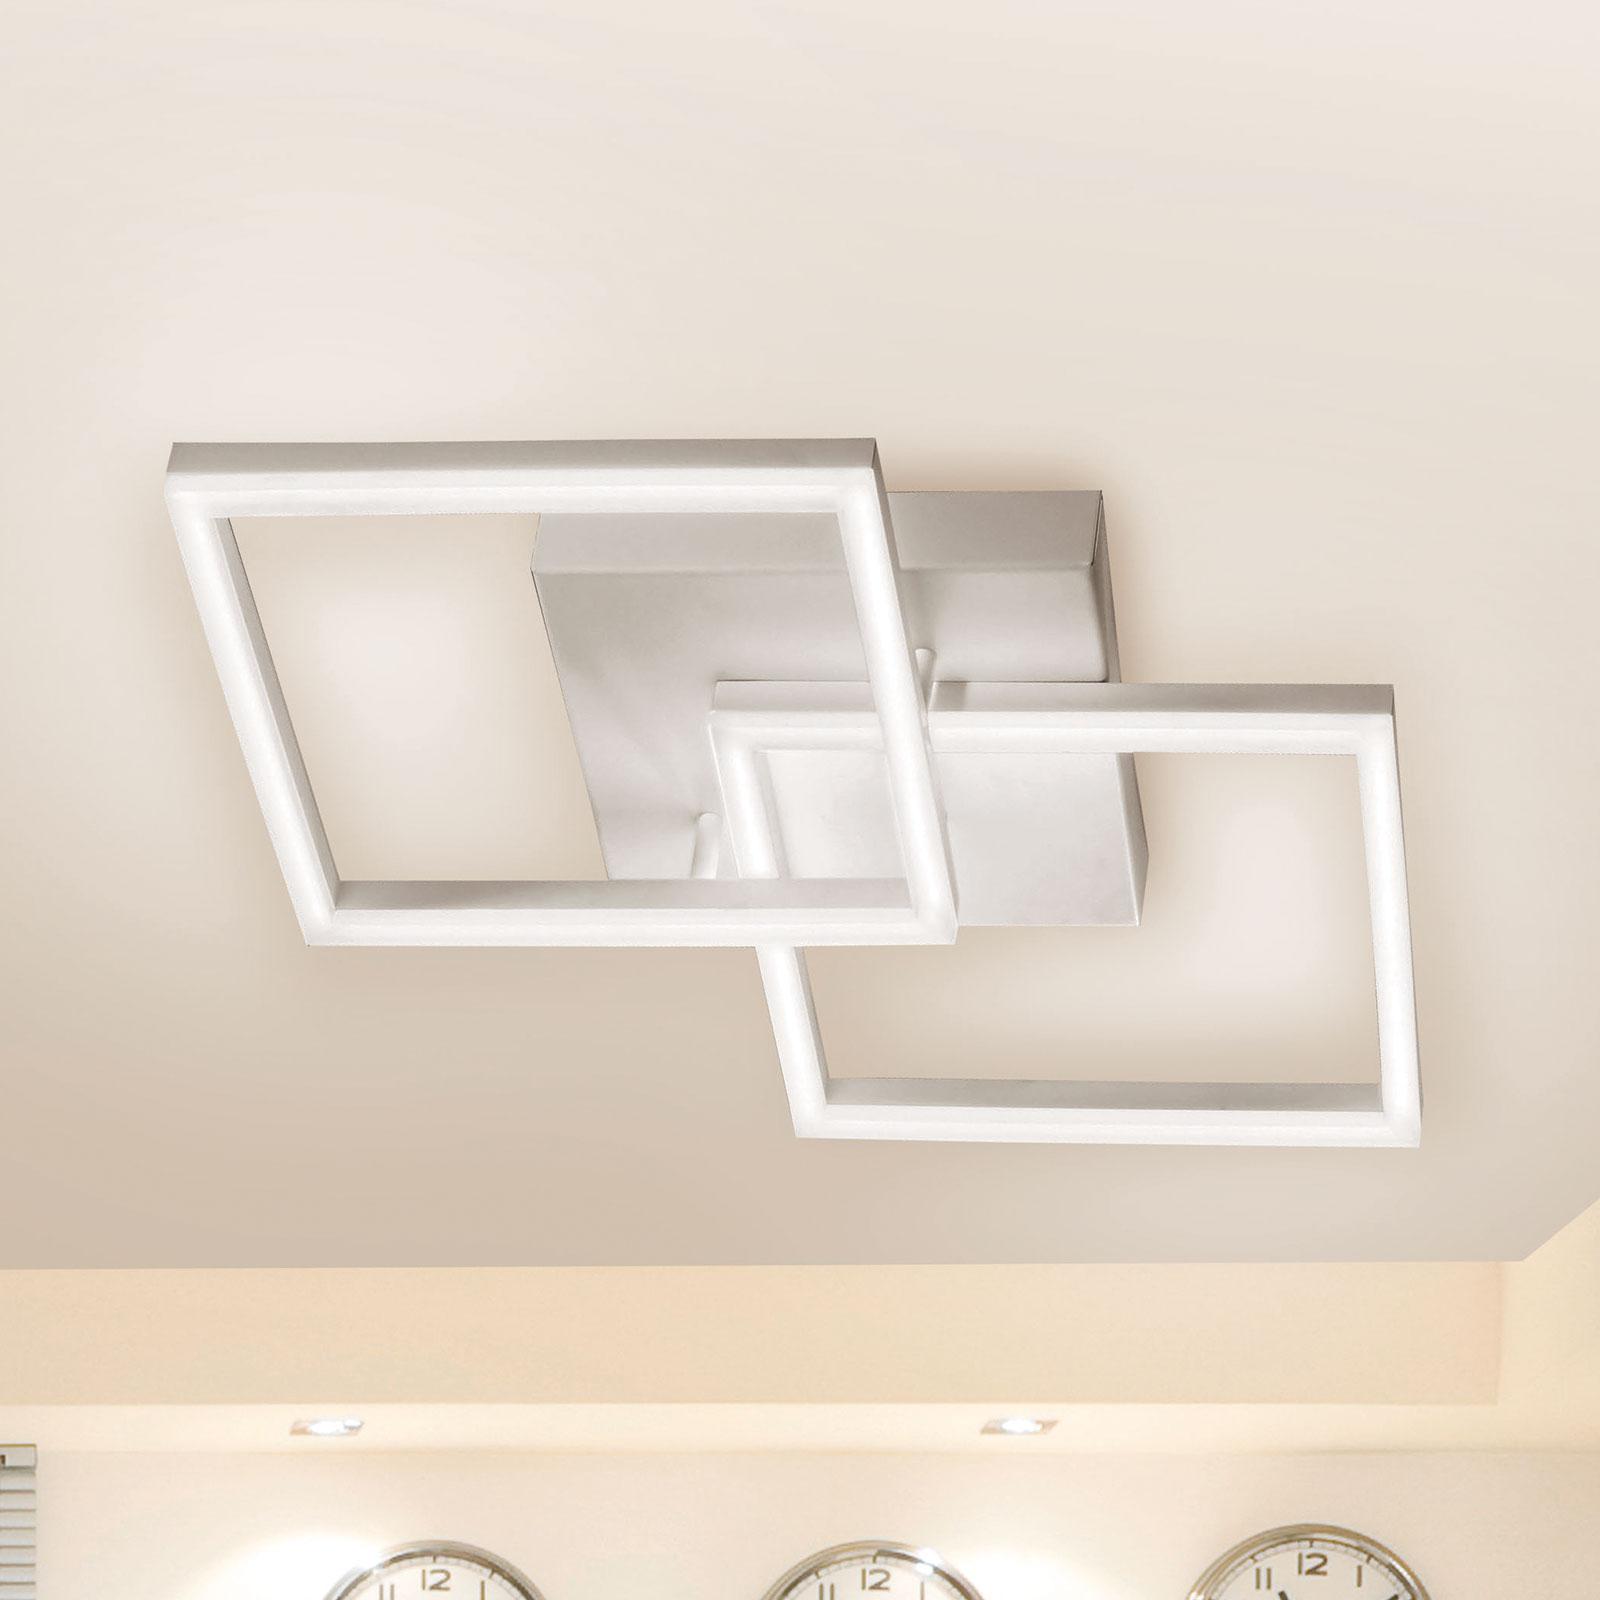 LED-taklampe Bard, 2lyskilder